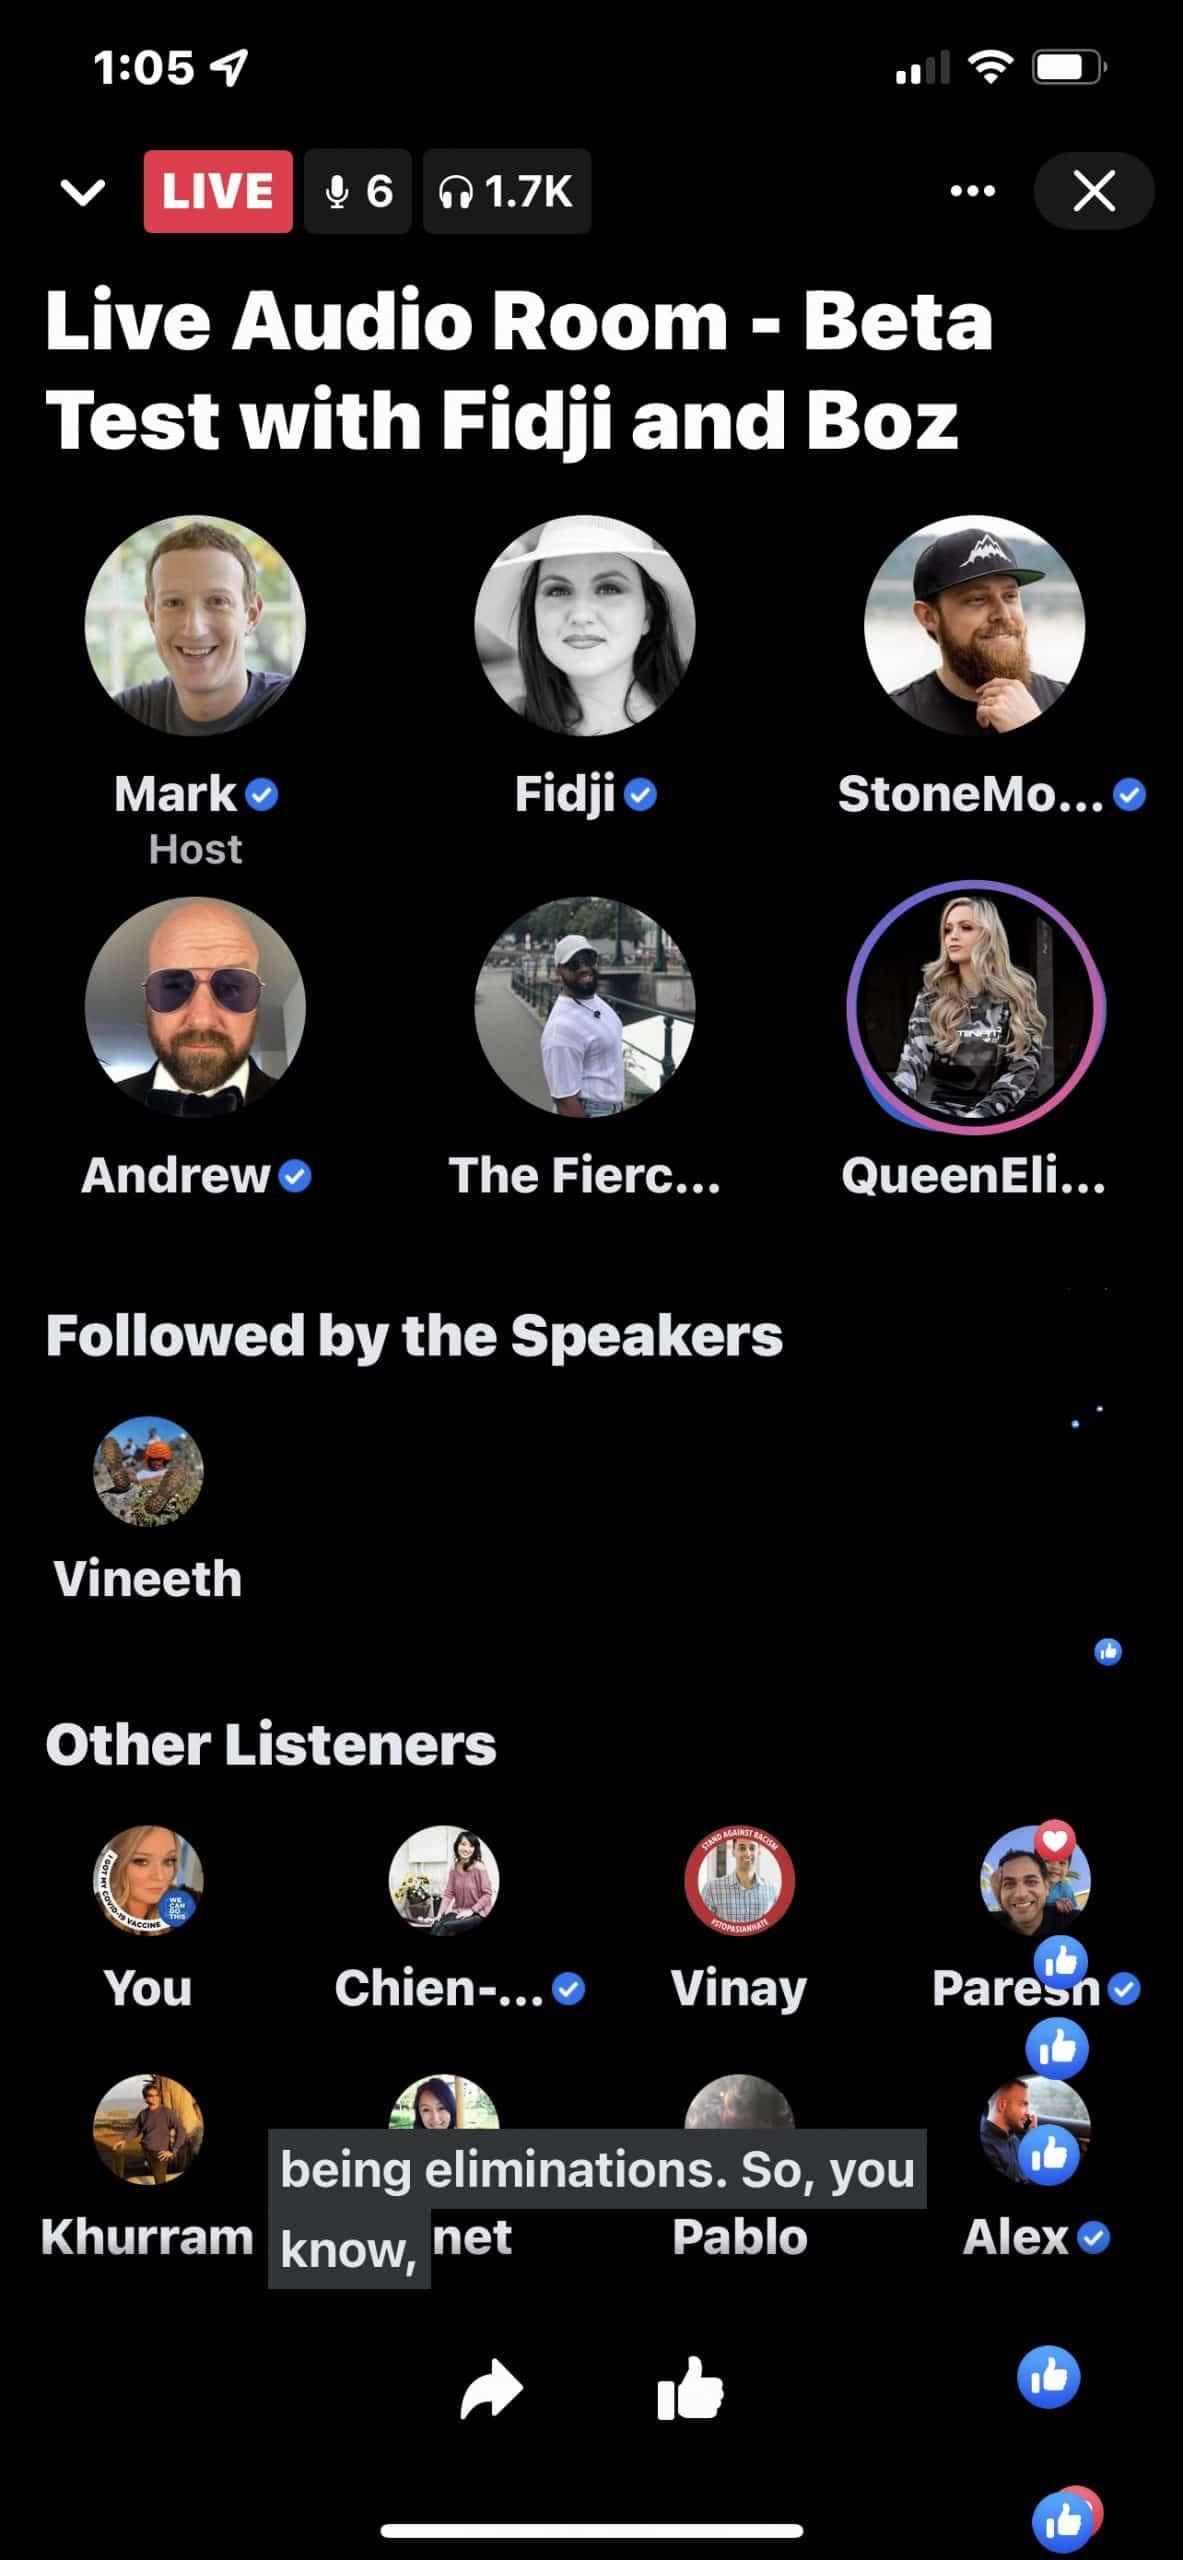 Participantes de un Live Audio Rooms en Facebook.